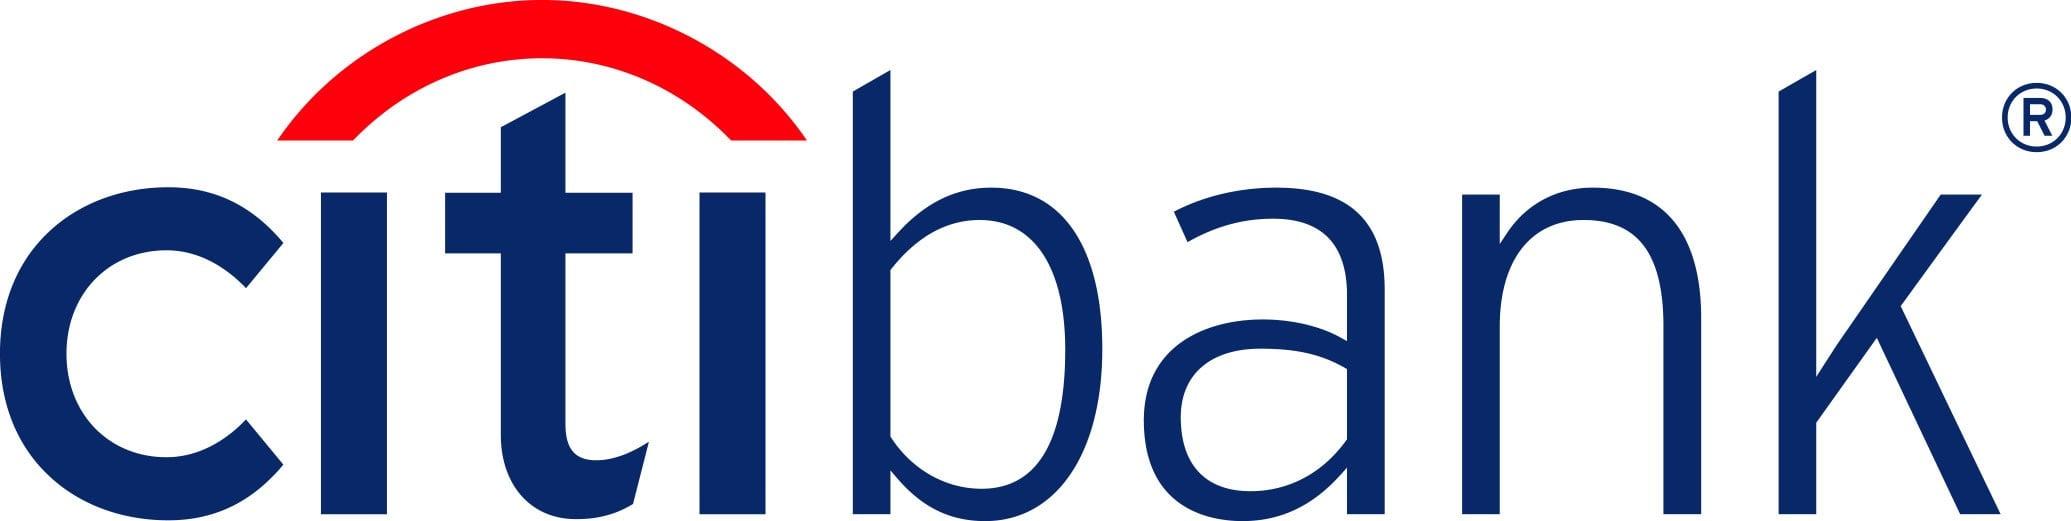 citibank-logo1.jpg